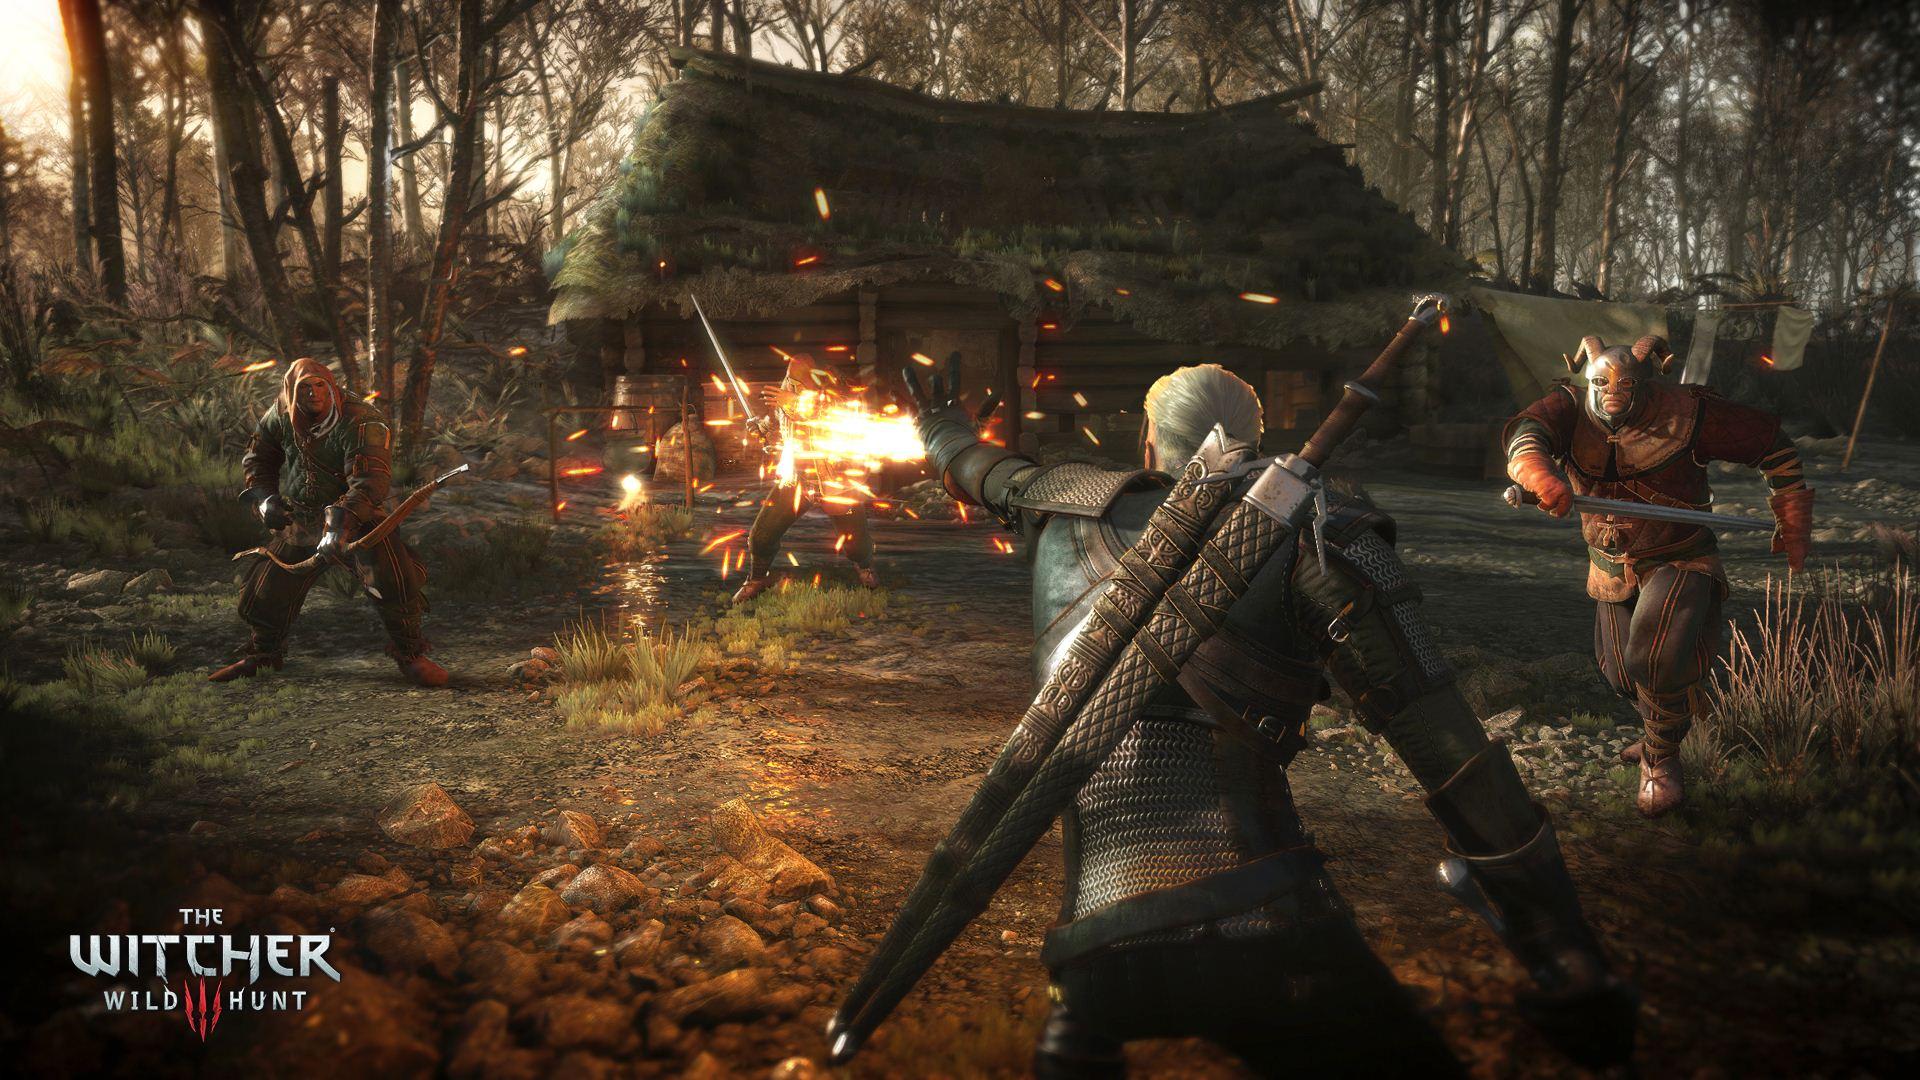 Knife block set quotes - The Witcher 3 Frame Rate Vergleich Auf Xbox One Und Ps4